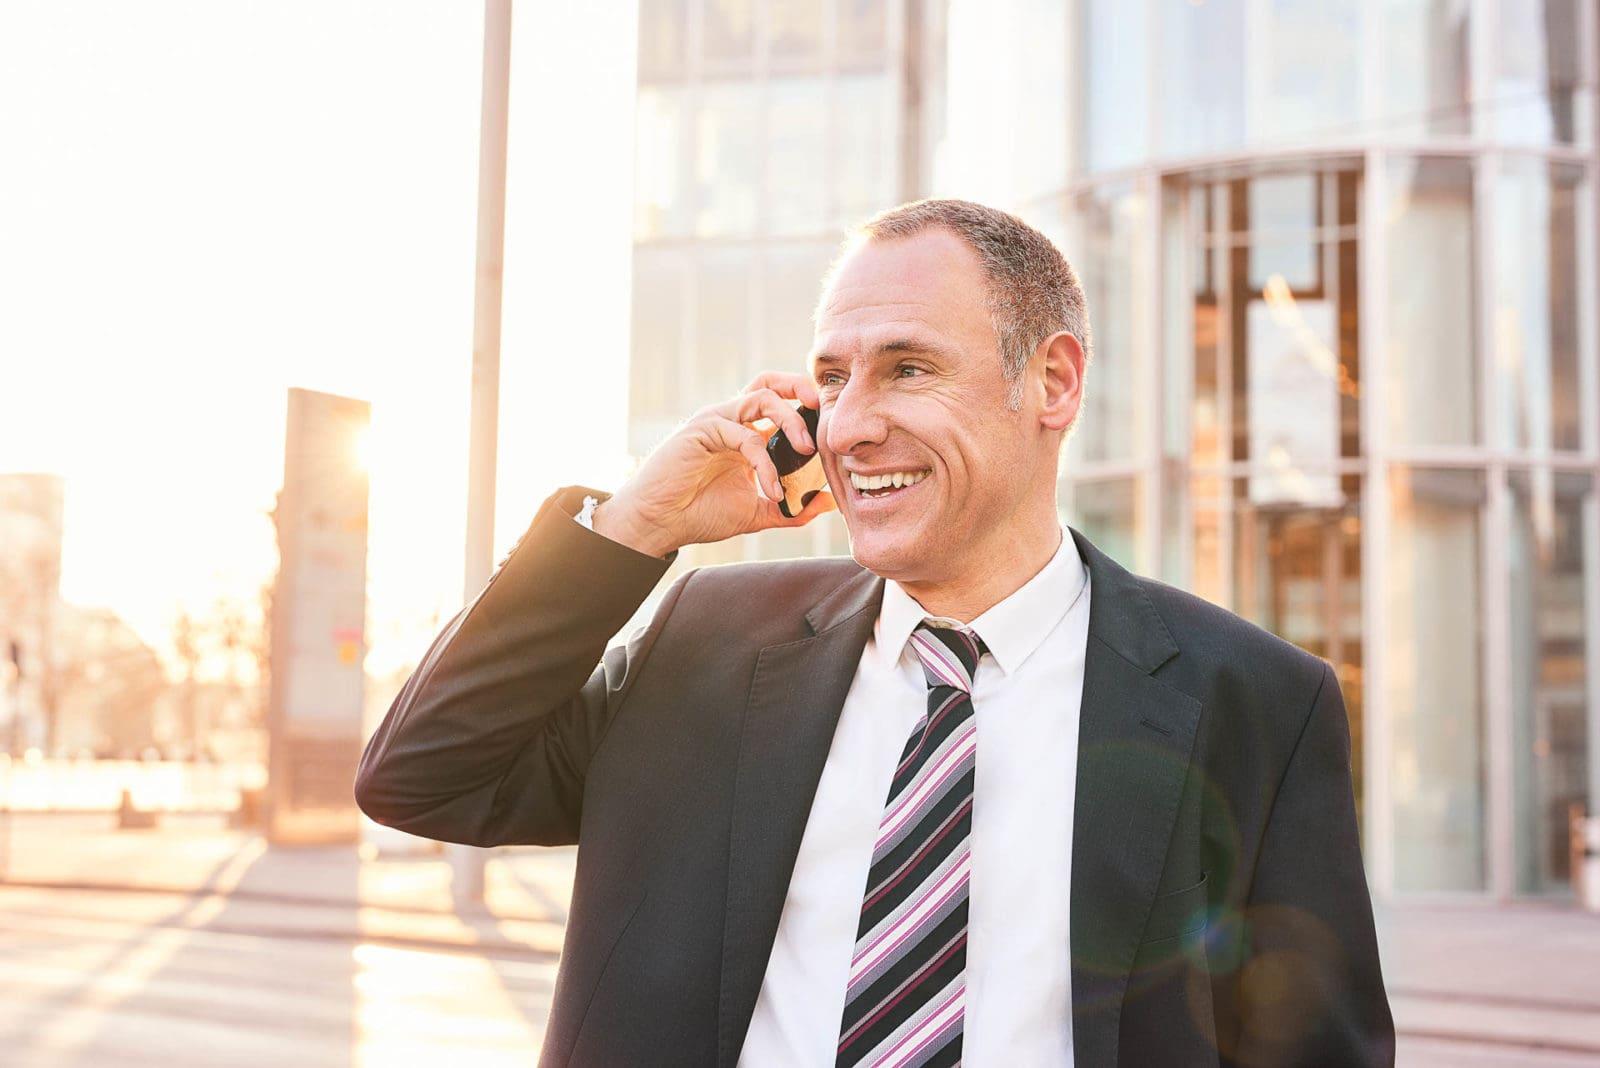 Bänker telefoniert vor Büro